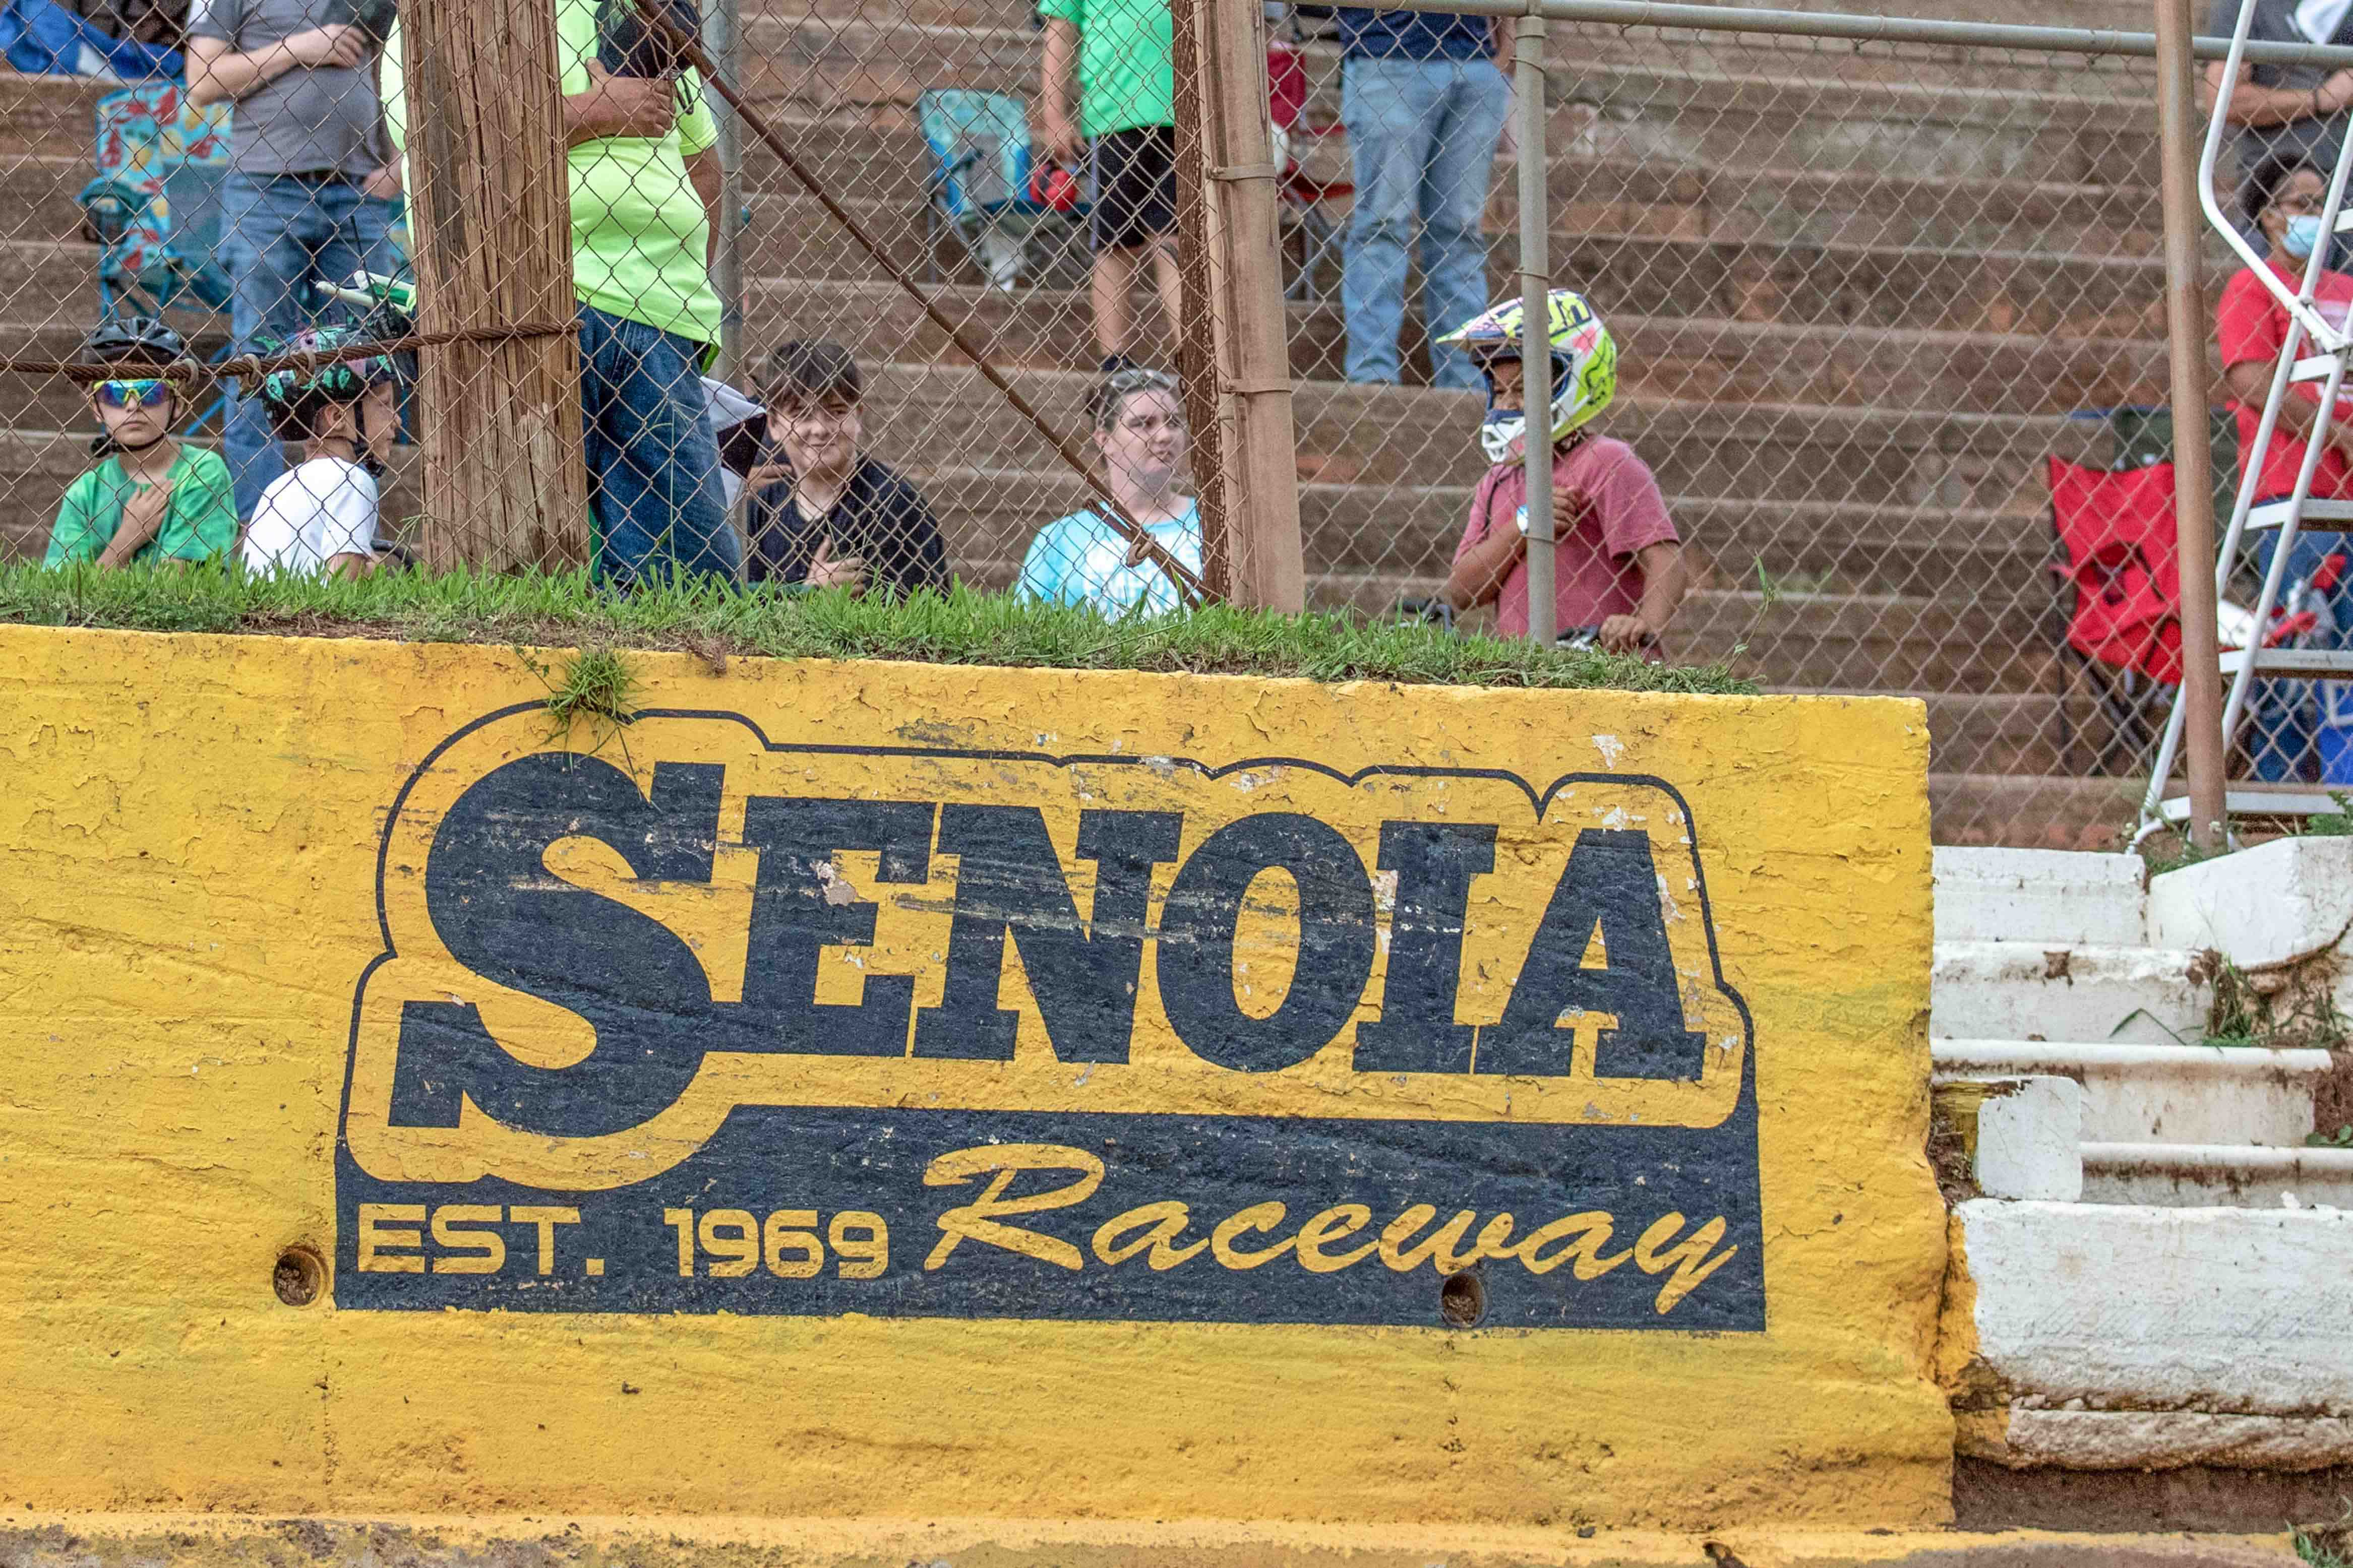 07-21-2021-Senoia-Race-014.jpg?mtime=20210720172824#asset:63569